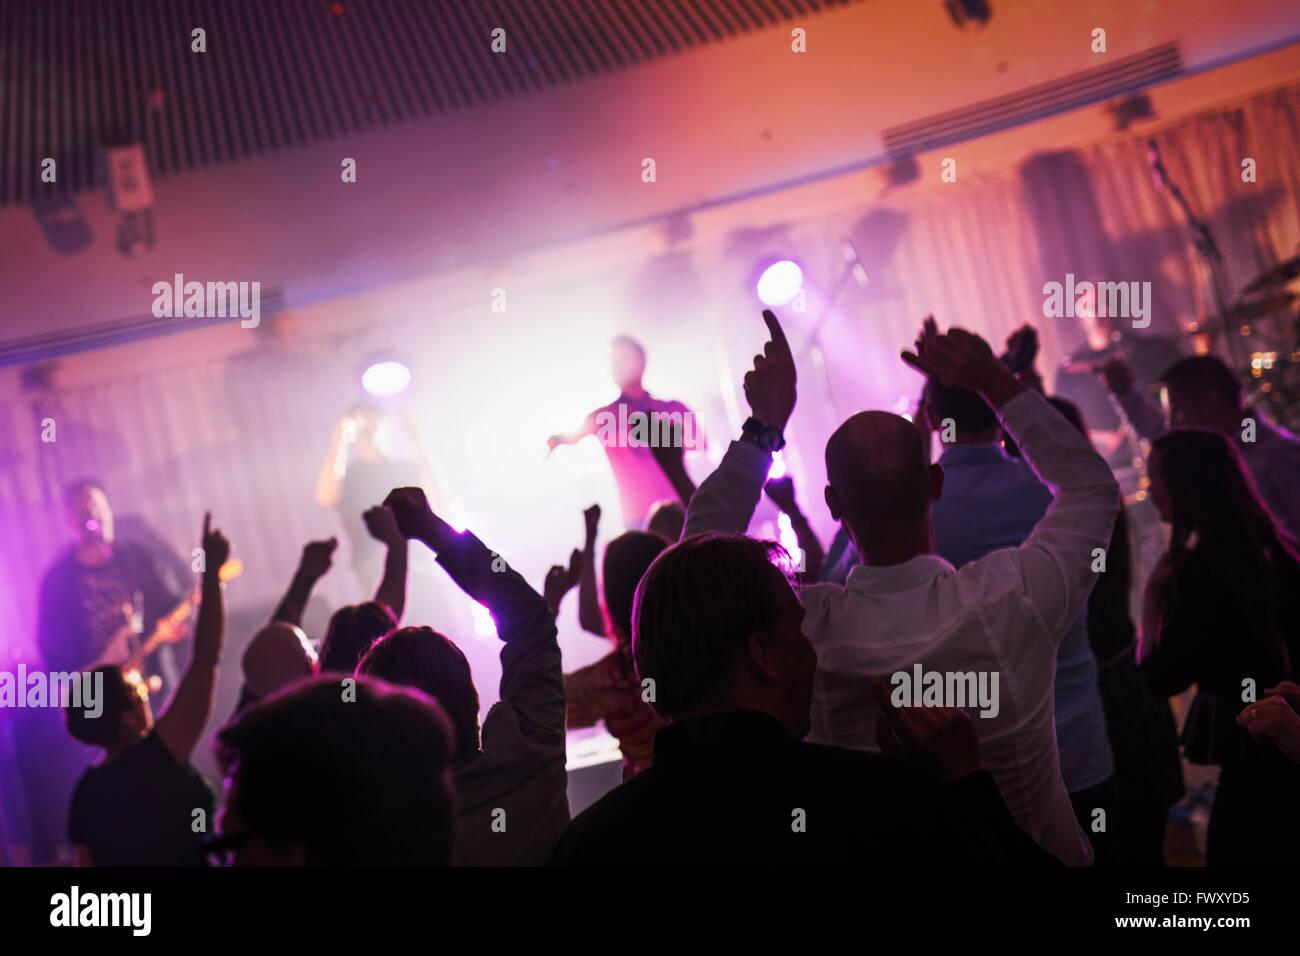 Finland, Varsinais-Suomi, Turku, Fans dancing at music festival - Stock Image